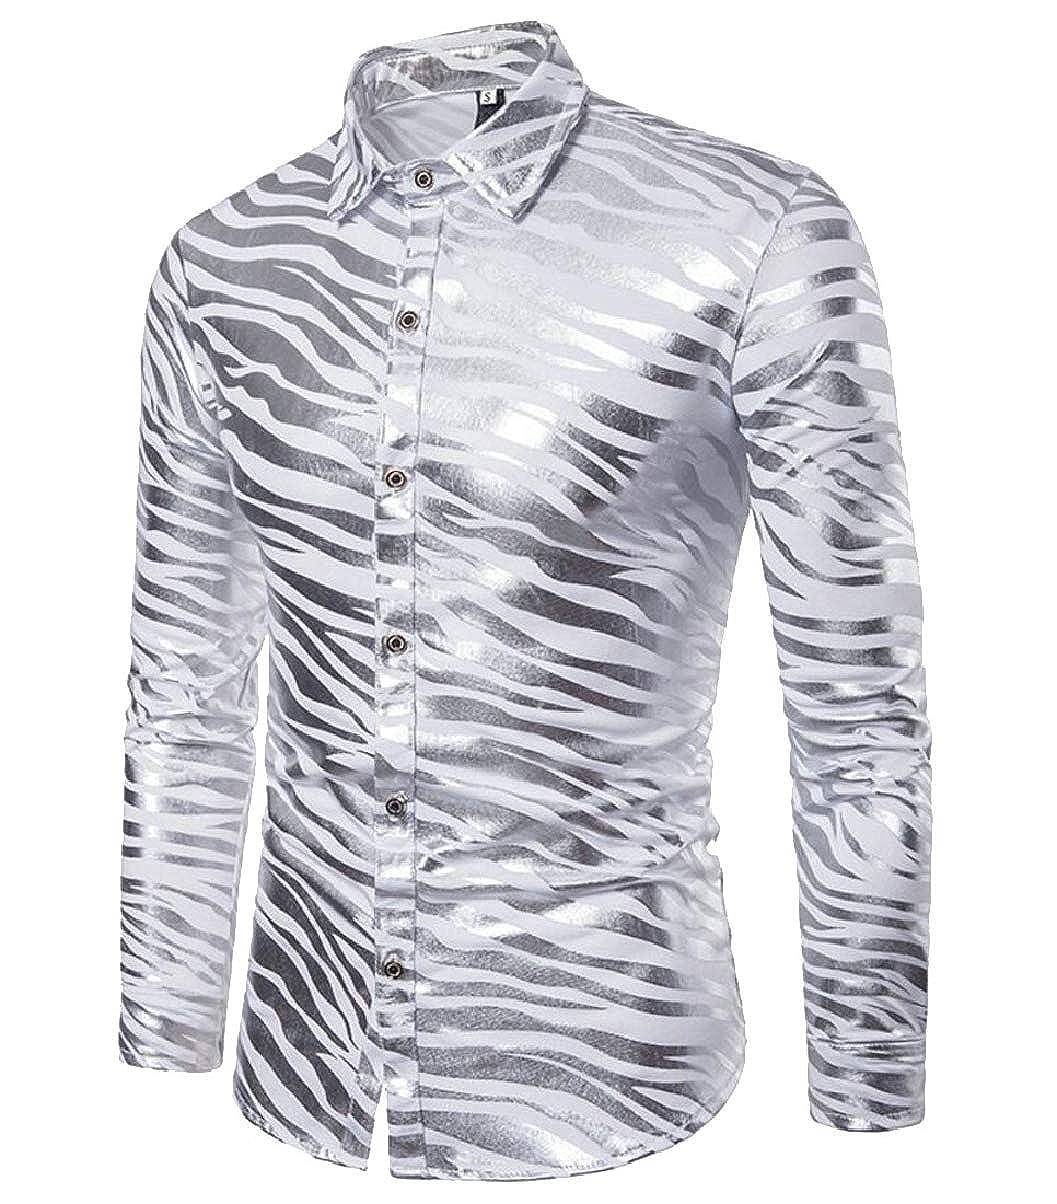 ZXFHZS Mens Striped Print Slim Fit Metallic Long Sleeve Button Down Dress Shirt